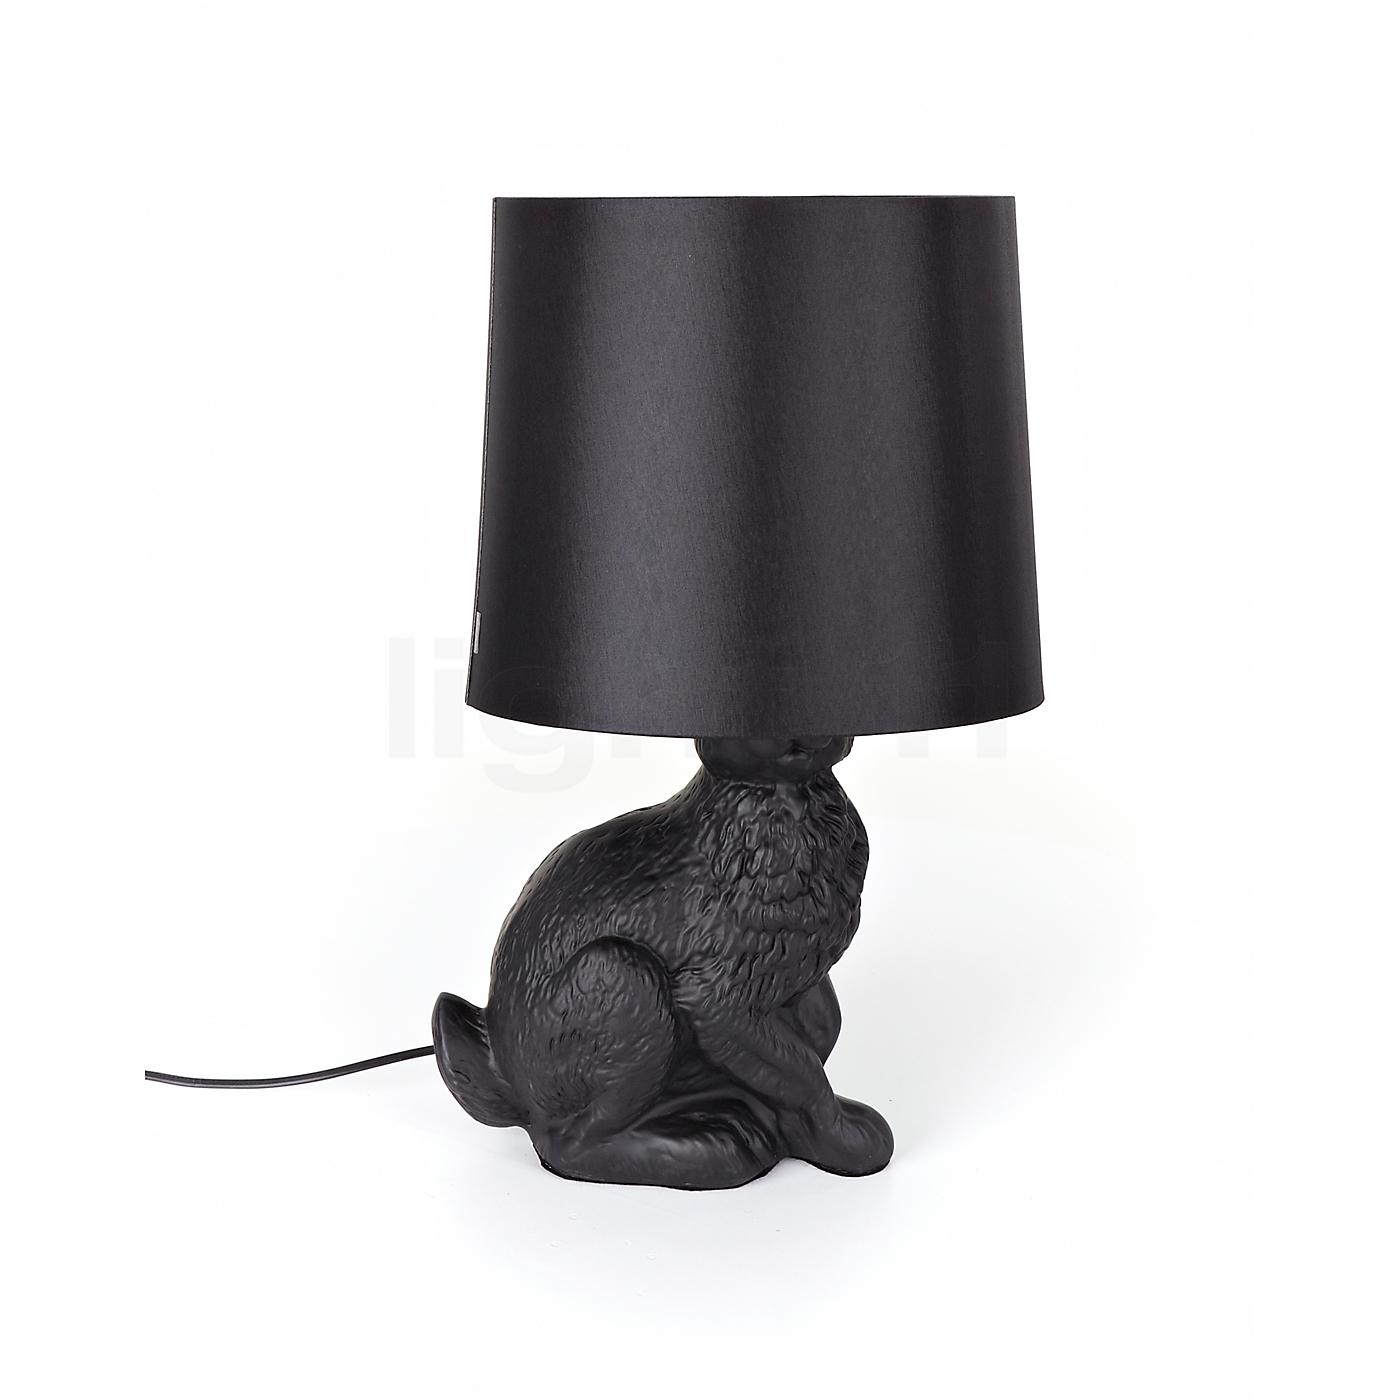 moooi rabbit lamp table lamps buy at. Black Bedroom Furniture Sets. Home Design Ideas